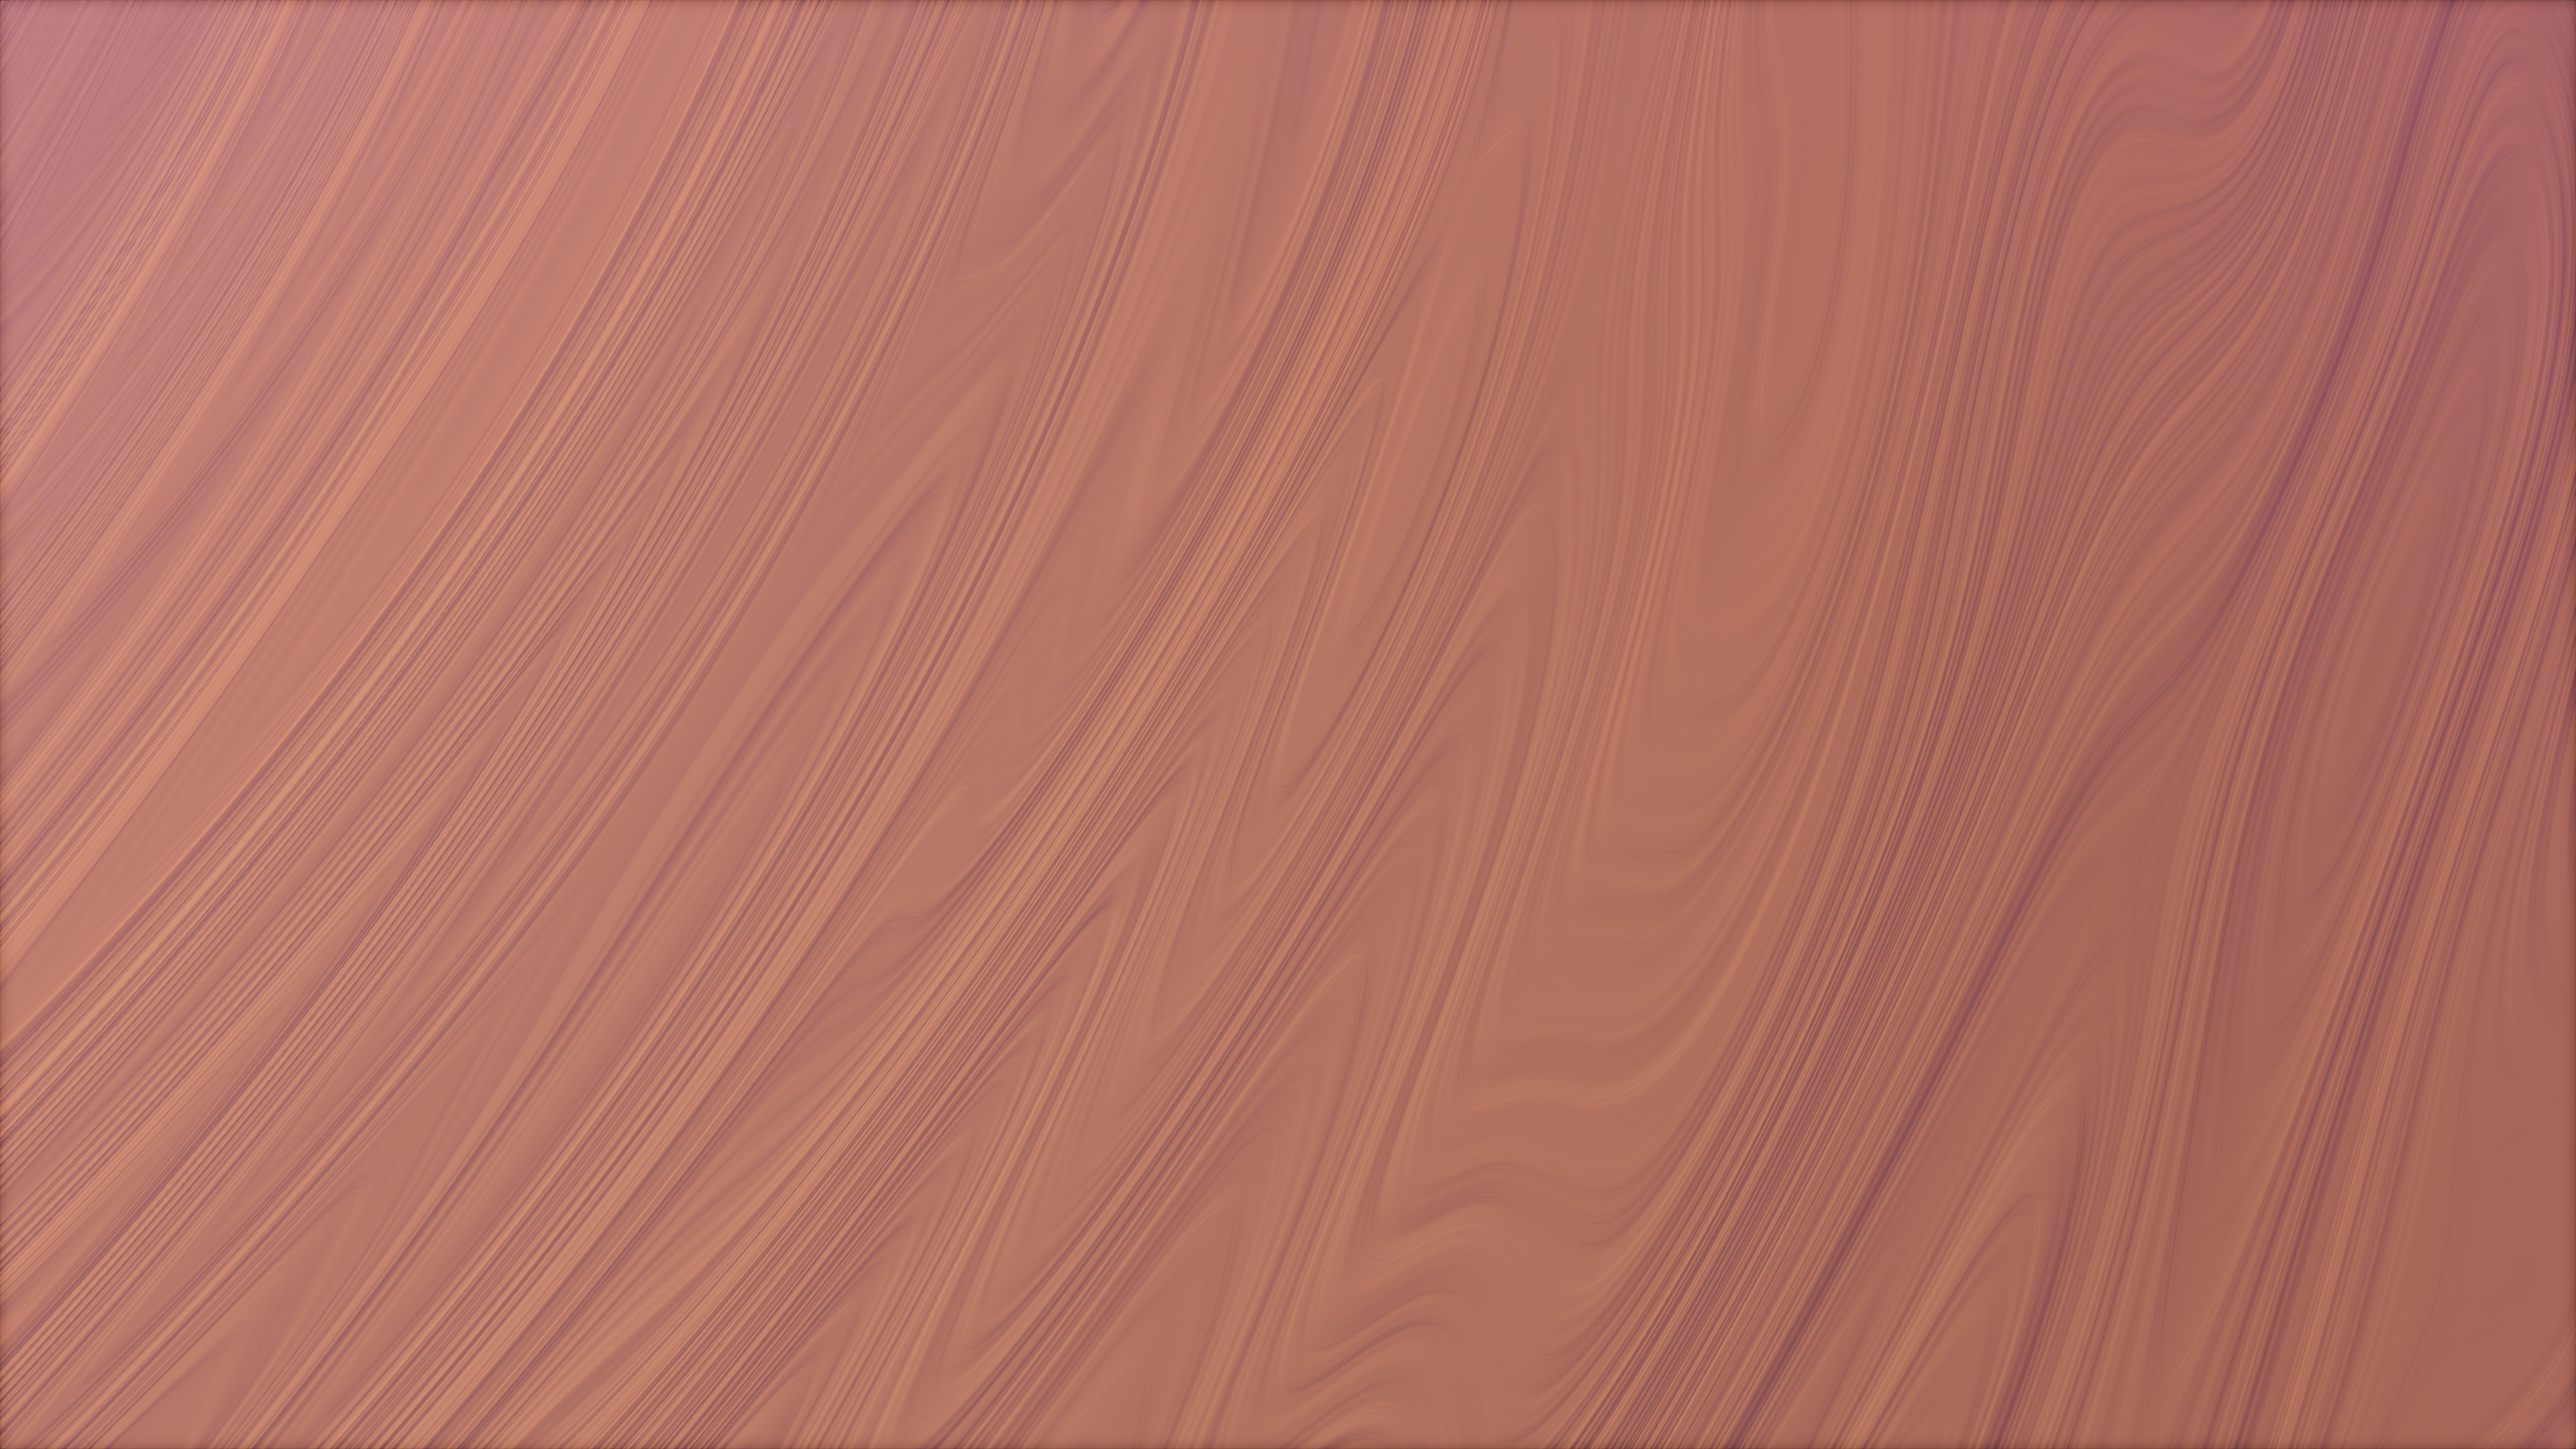 wood texture abstract 4k 1539371254 - Wood Texture Abstract 4k - wood wallpapers, texture wallpapers, hd-wallpapers, abstract wallpapers, 4k-wallpapers